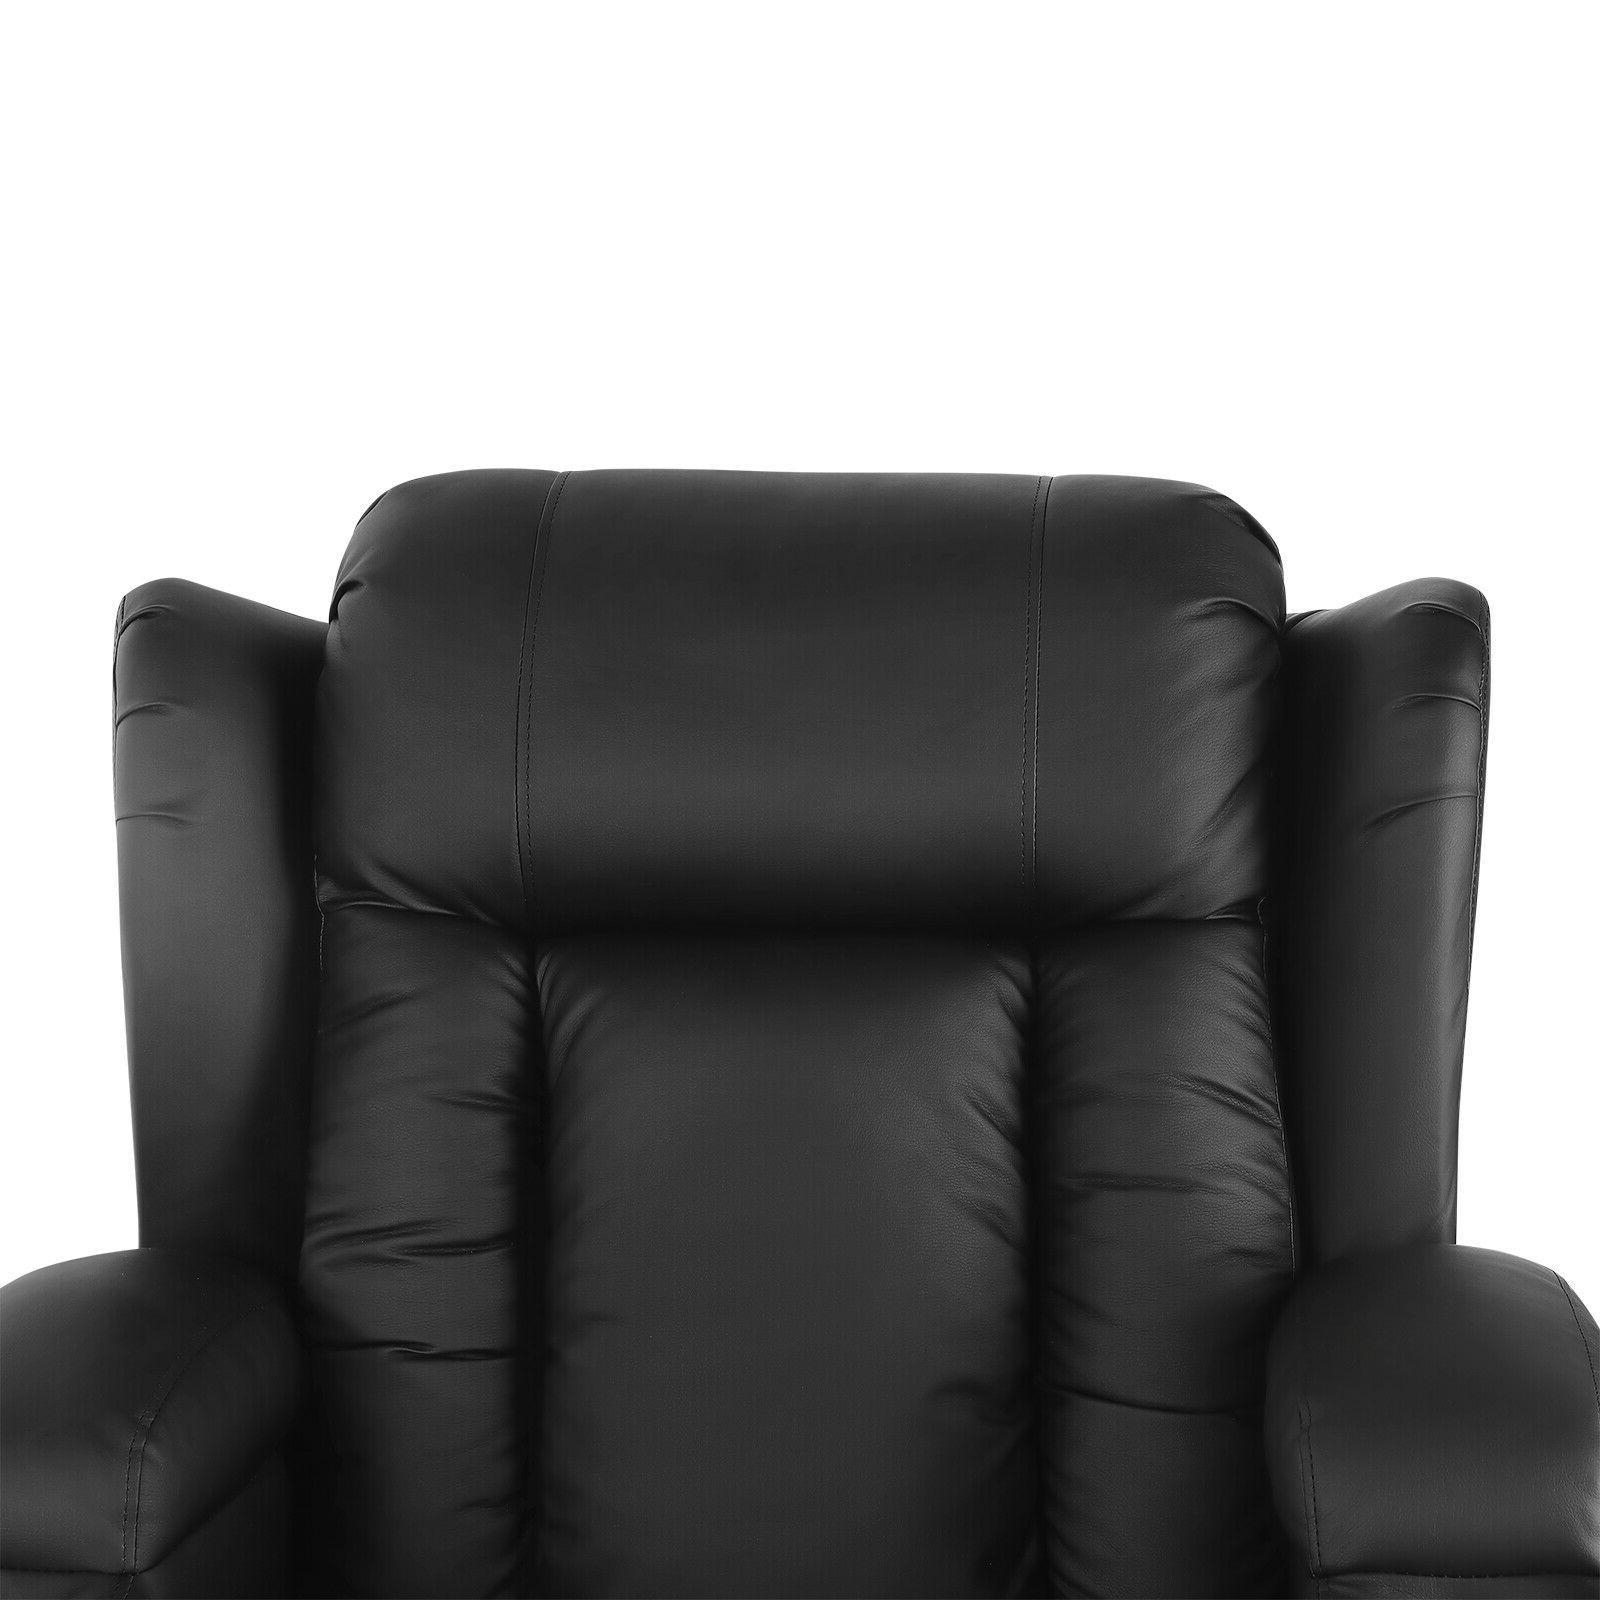 Oversize Leather Massage Recliner 360°Heat Rocking w/Control